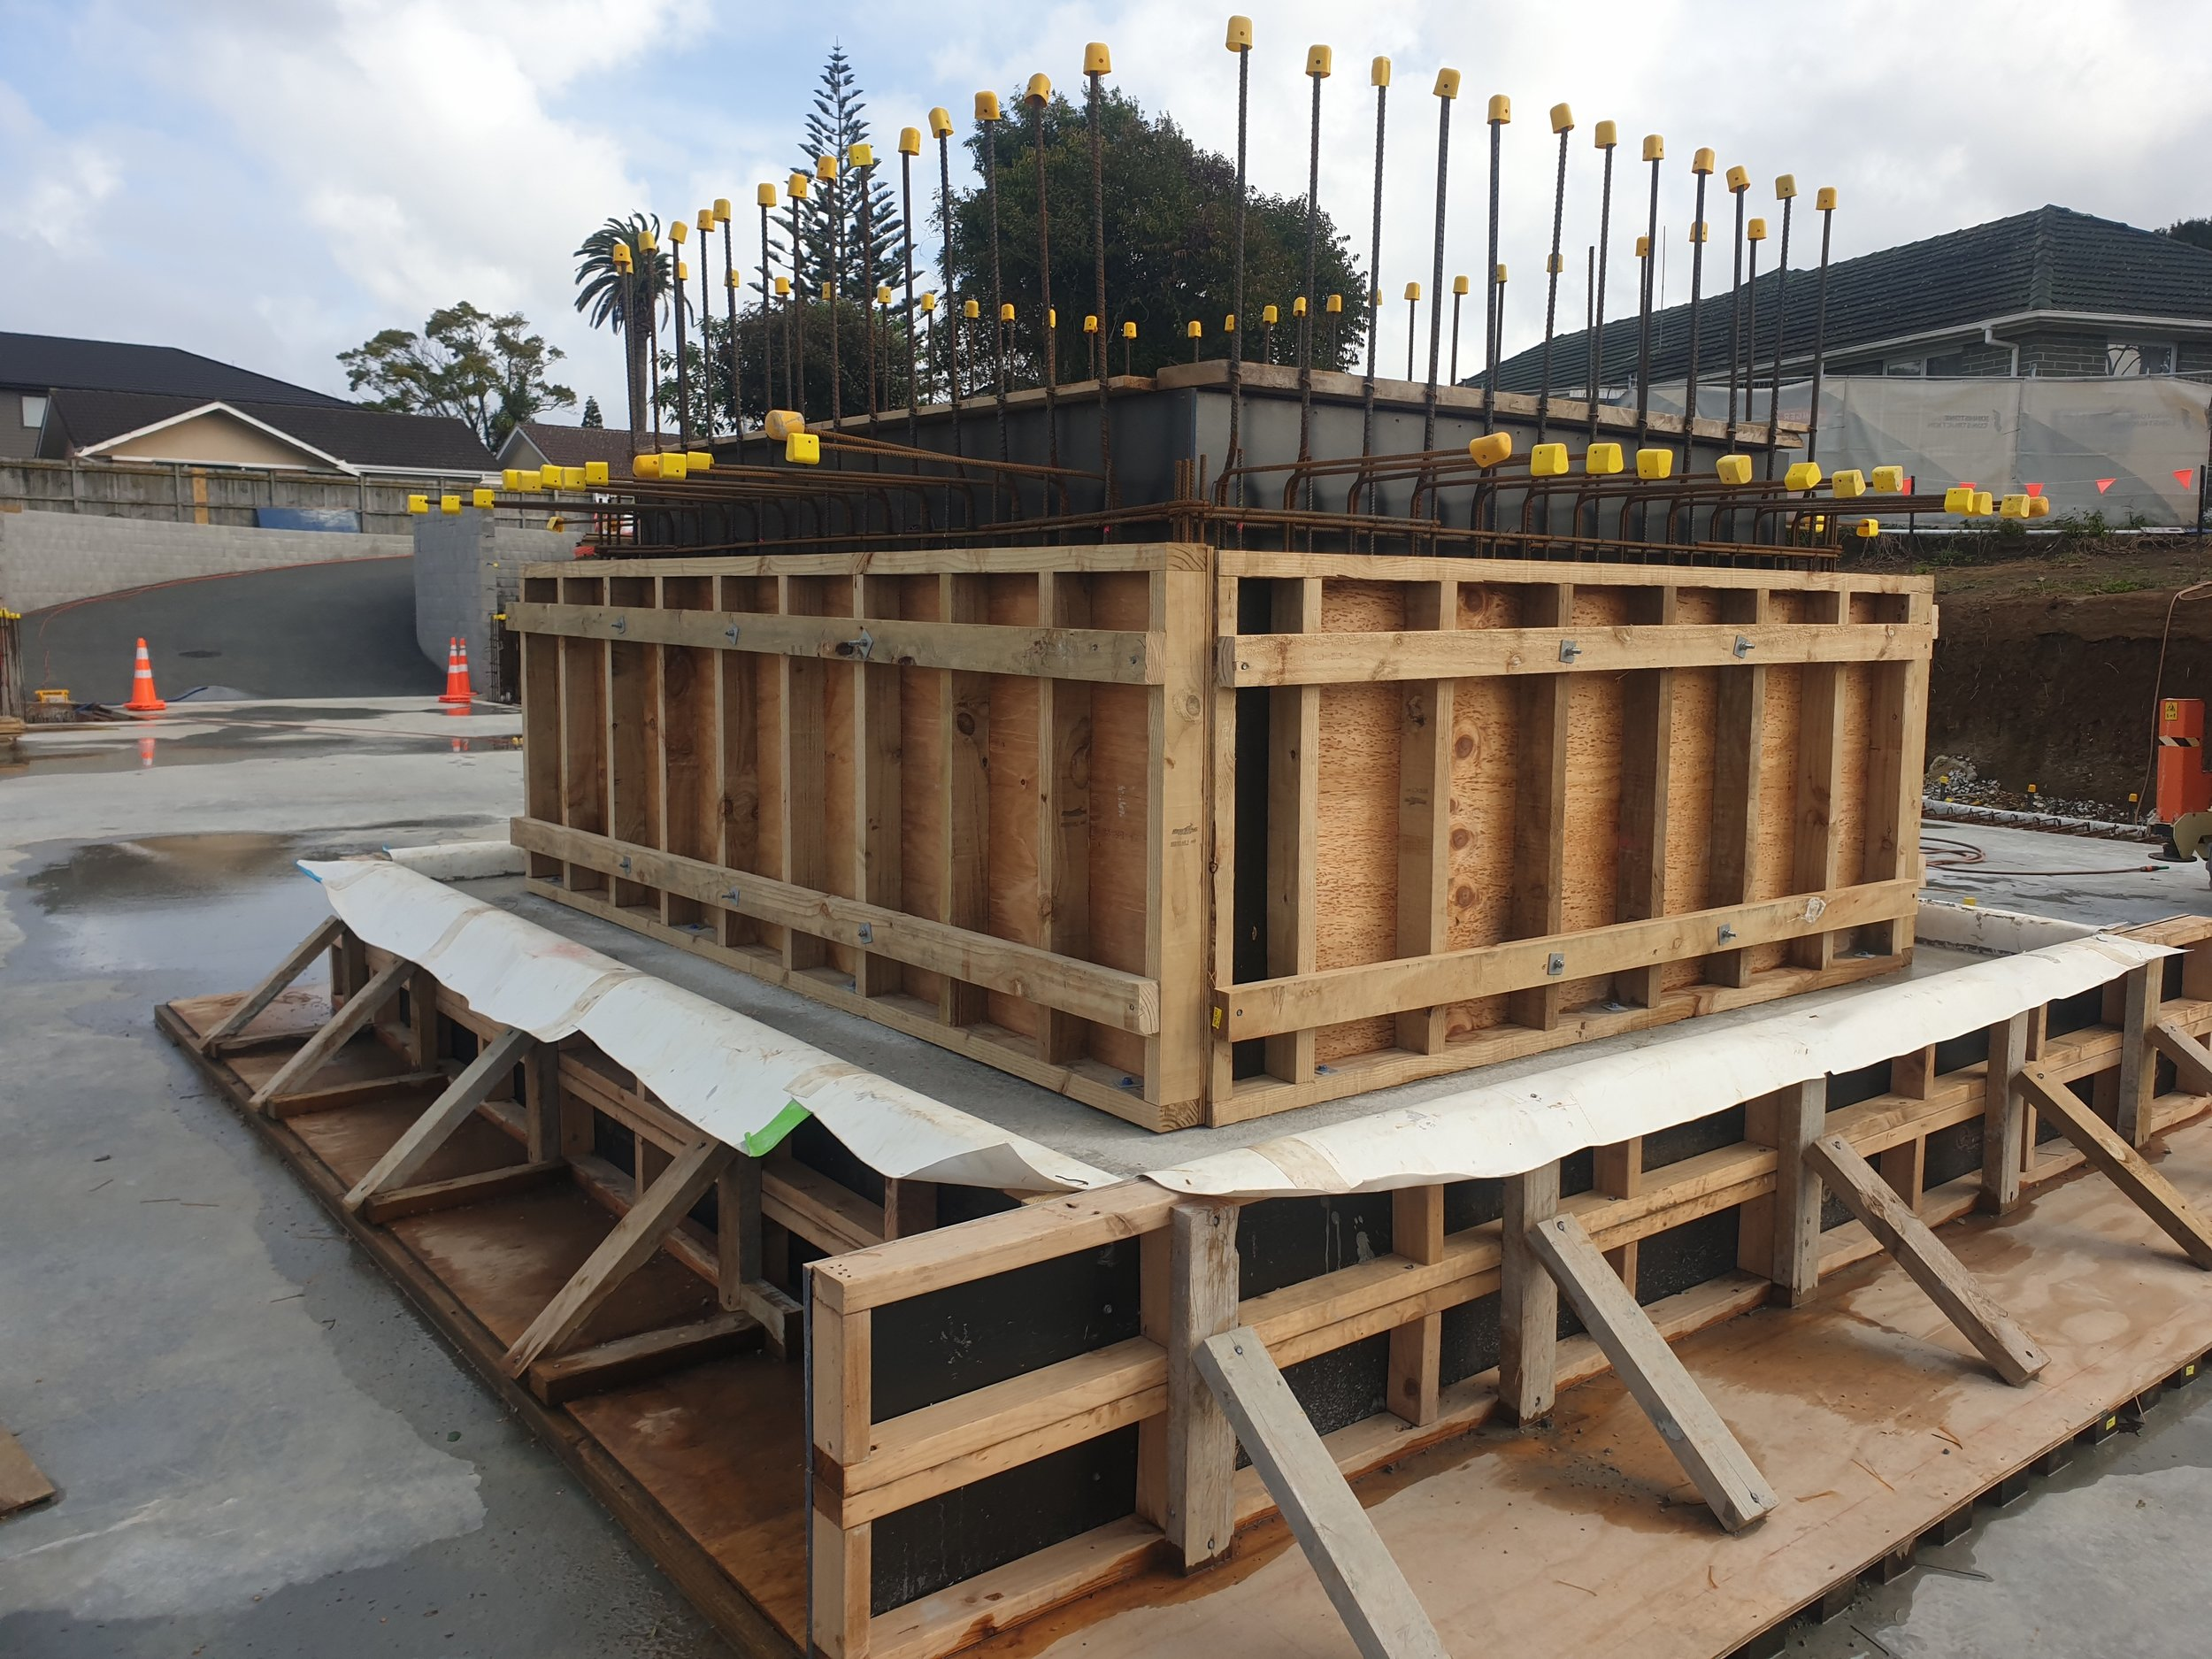 Lift Construction Underway